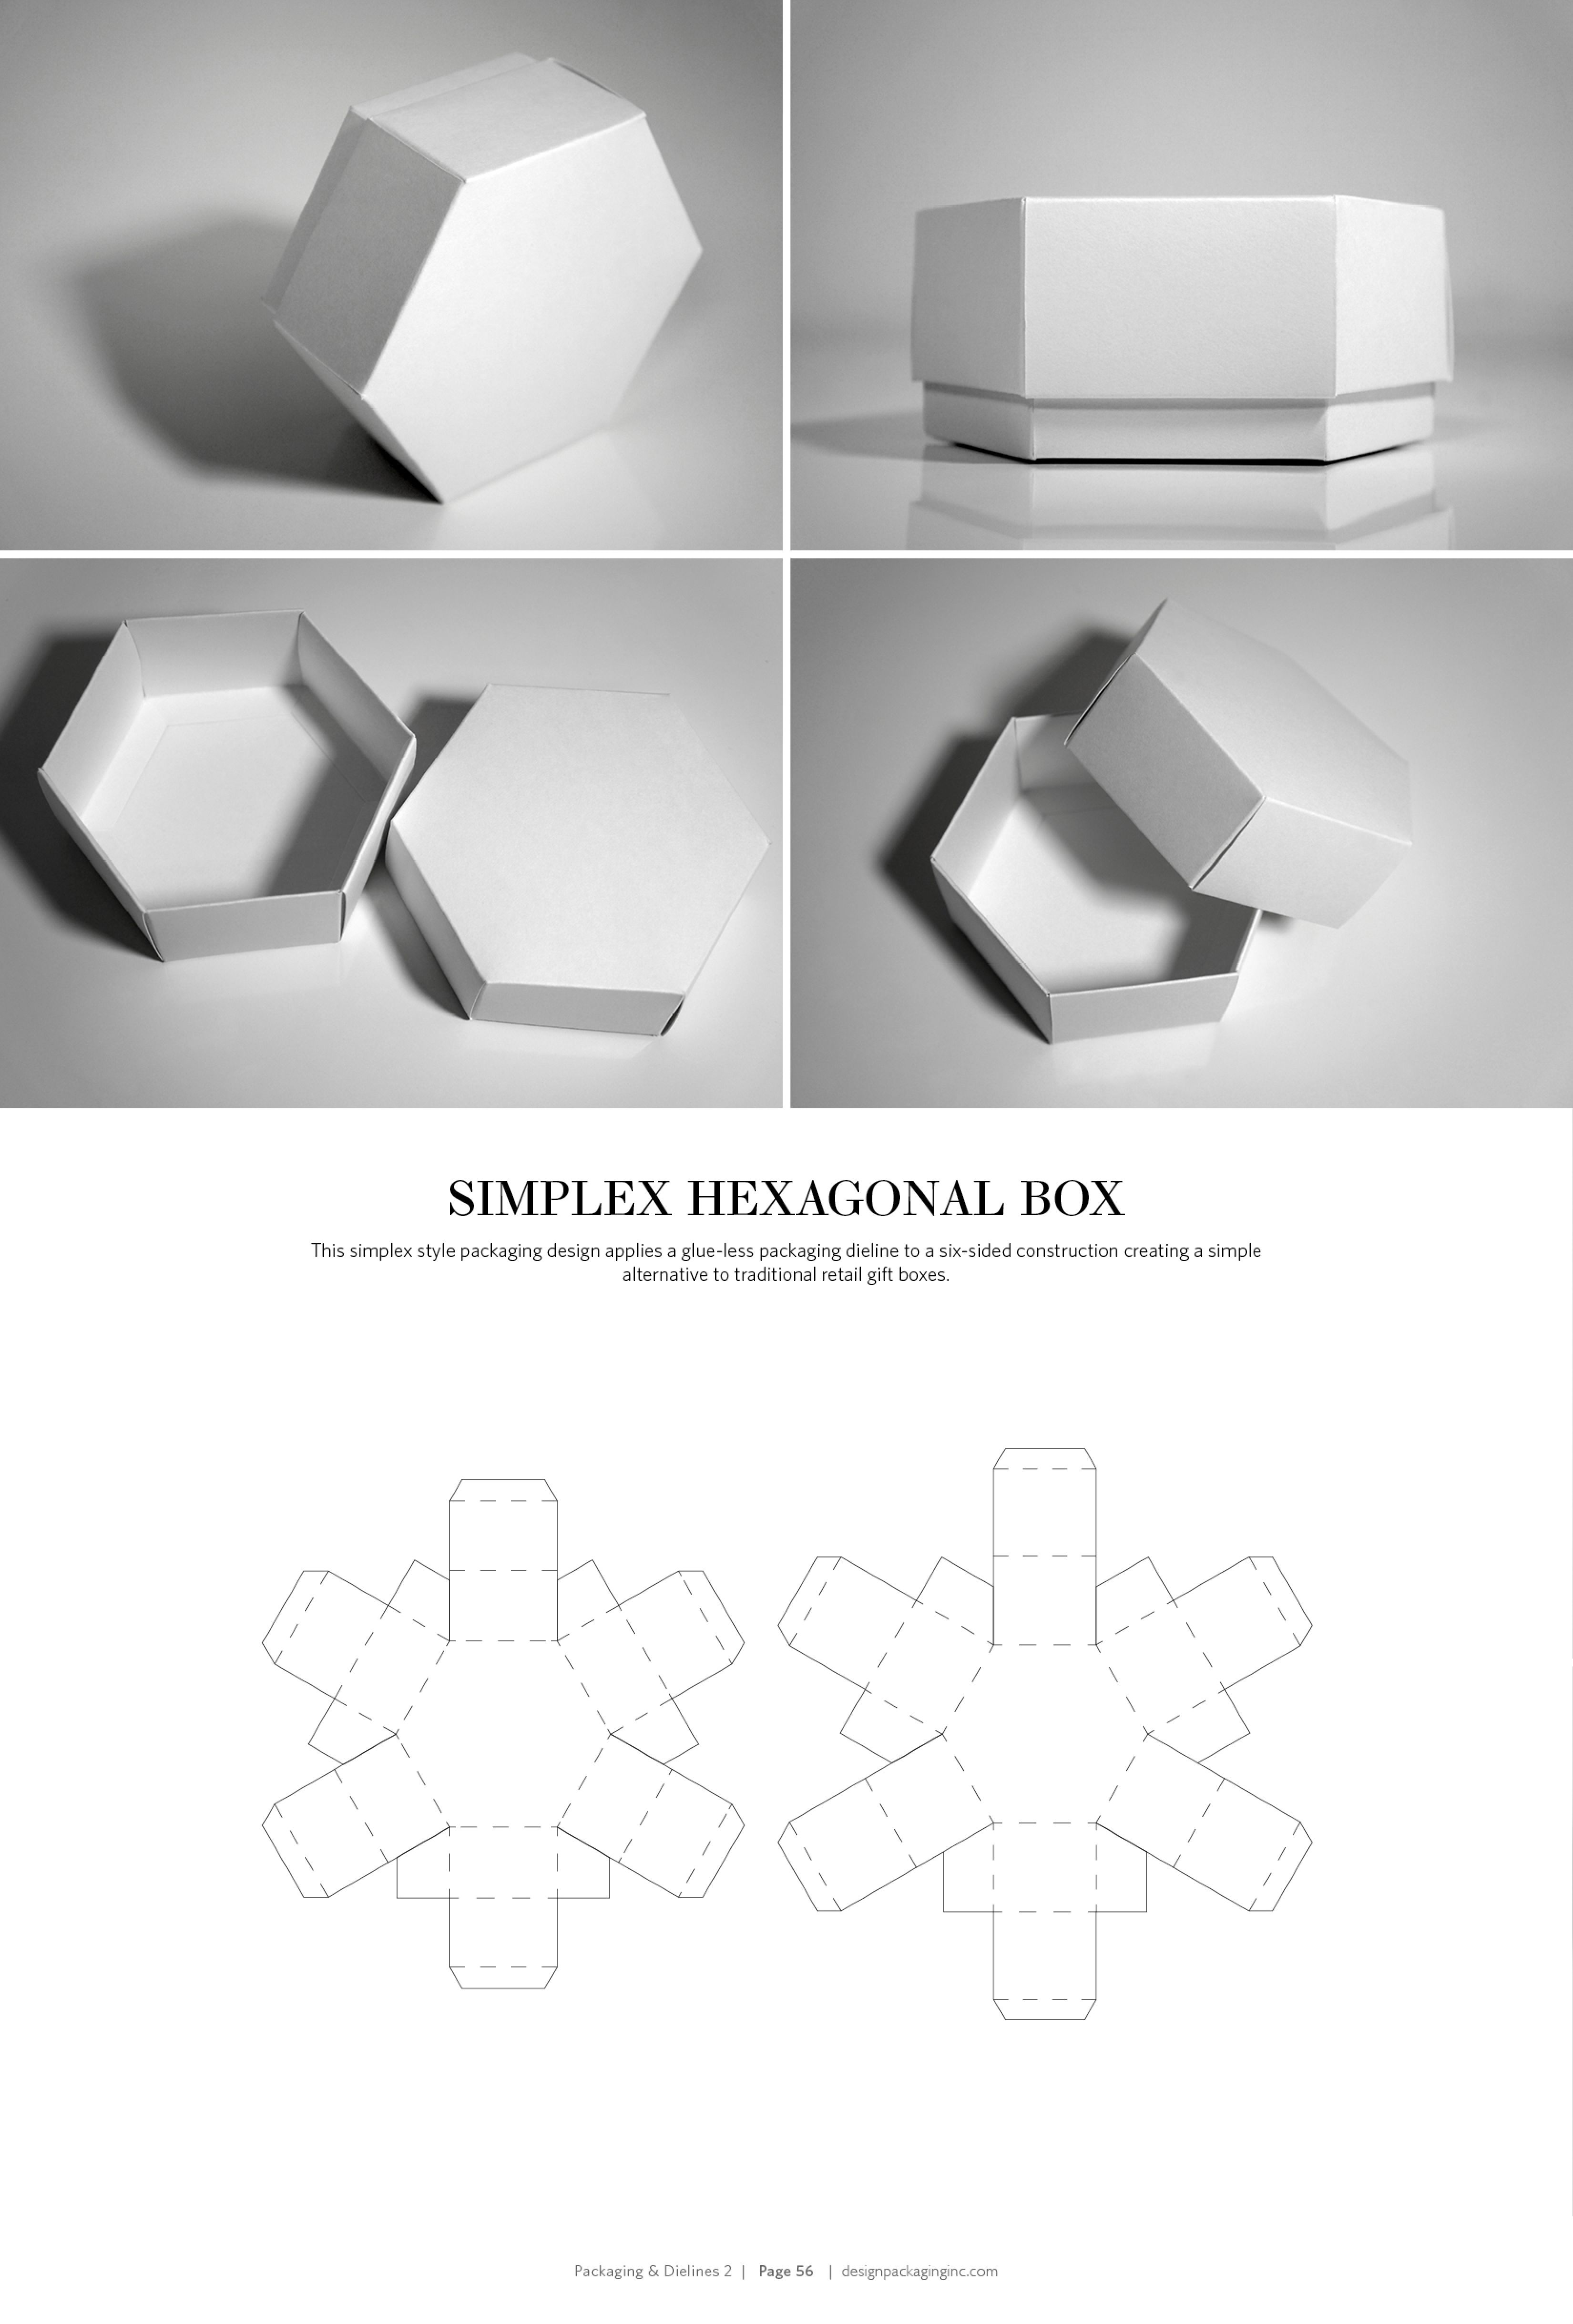 Simplex Hexagonal Box – structural packaging design dielines